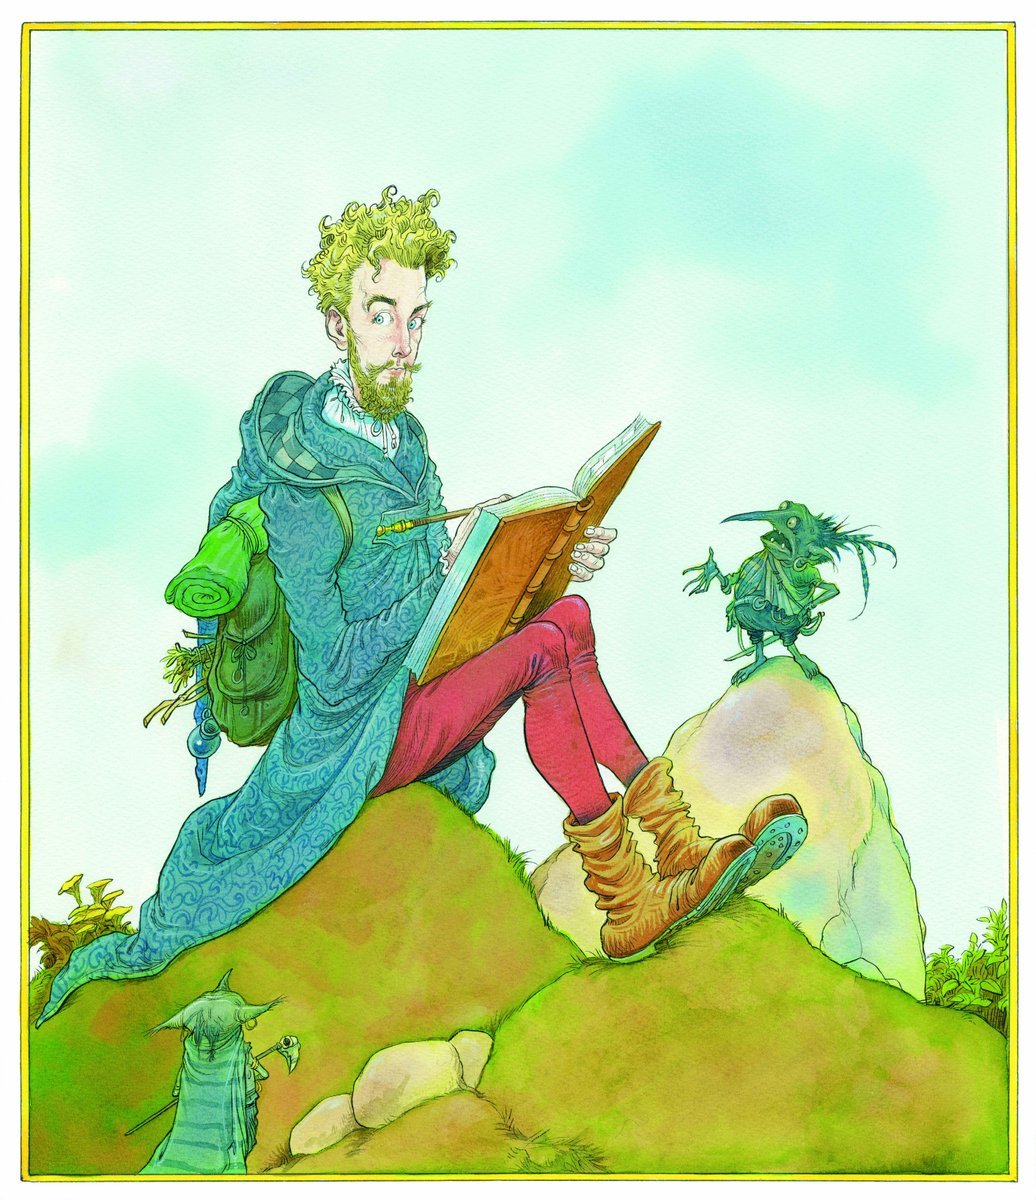 Beedle the Bard Illustration